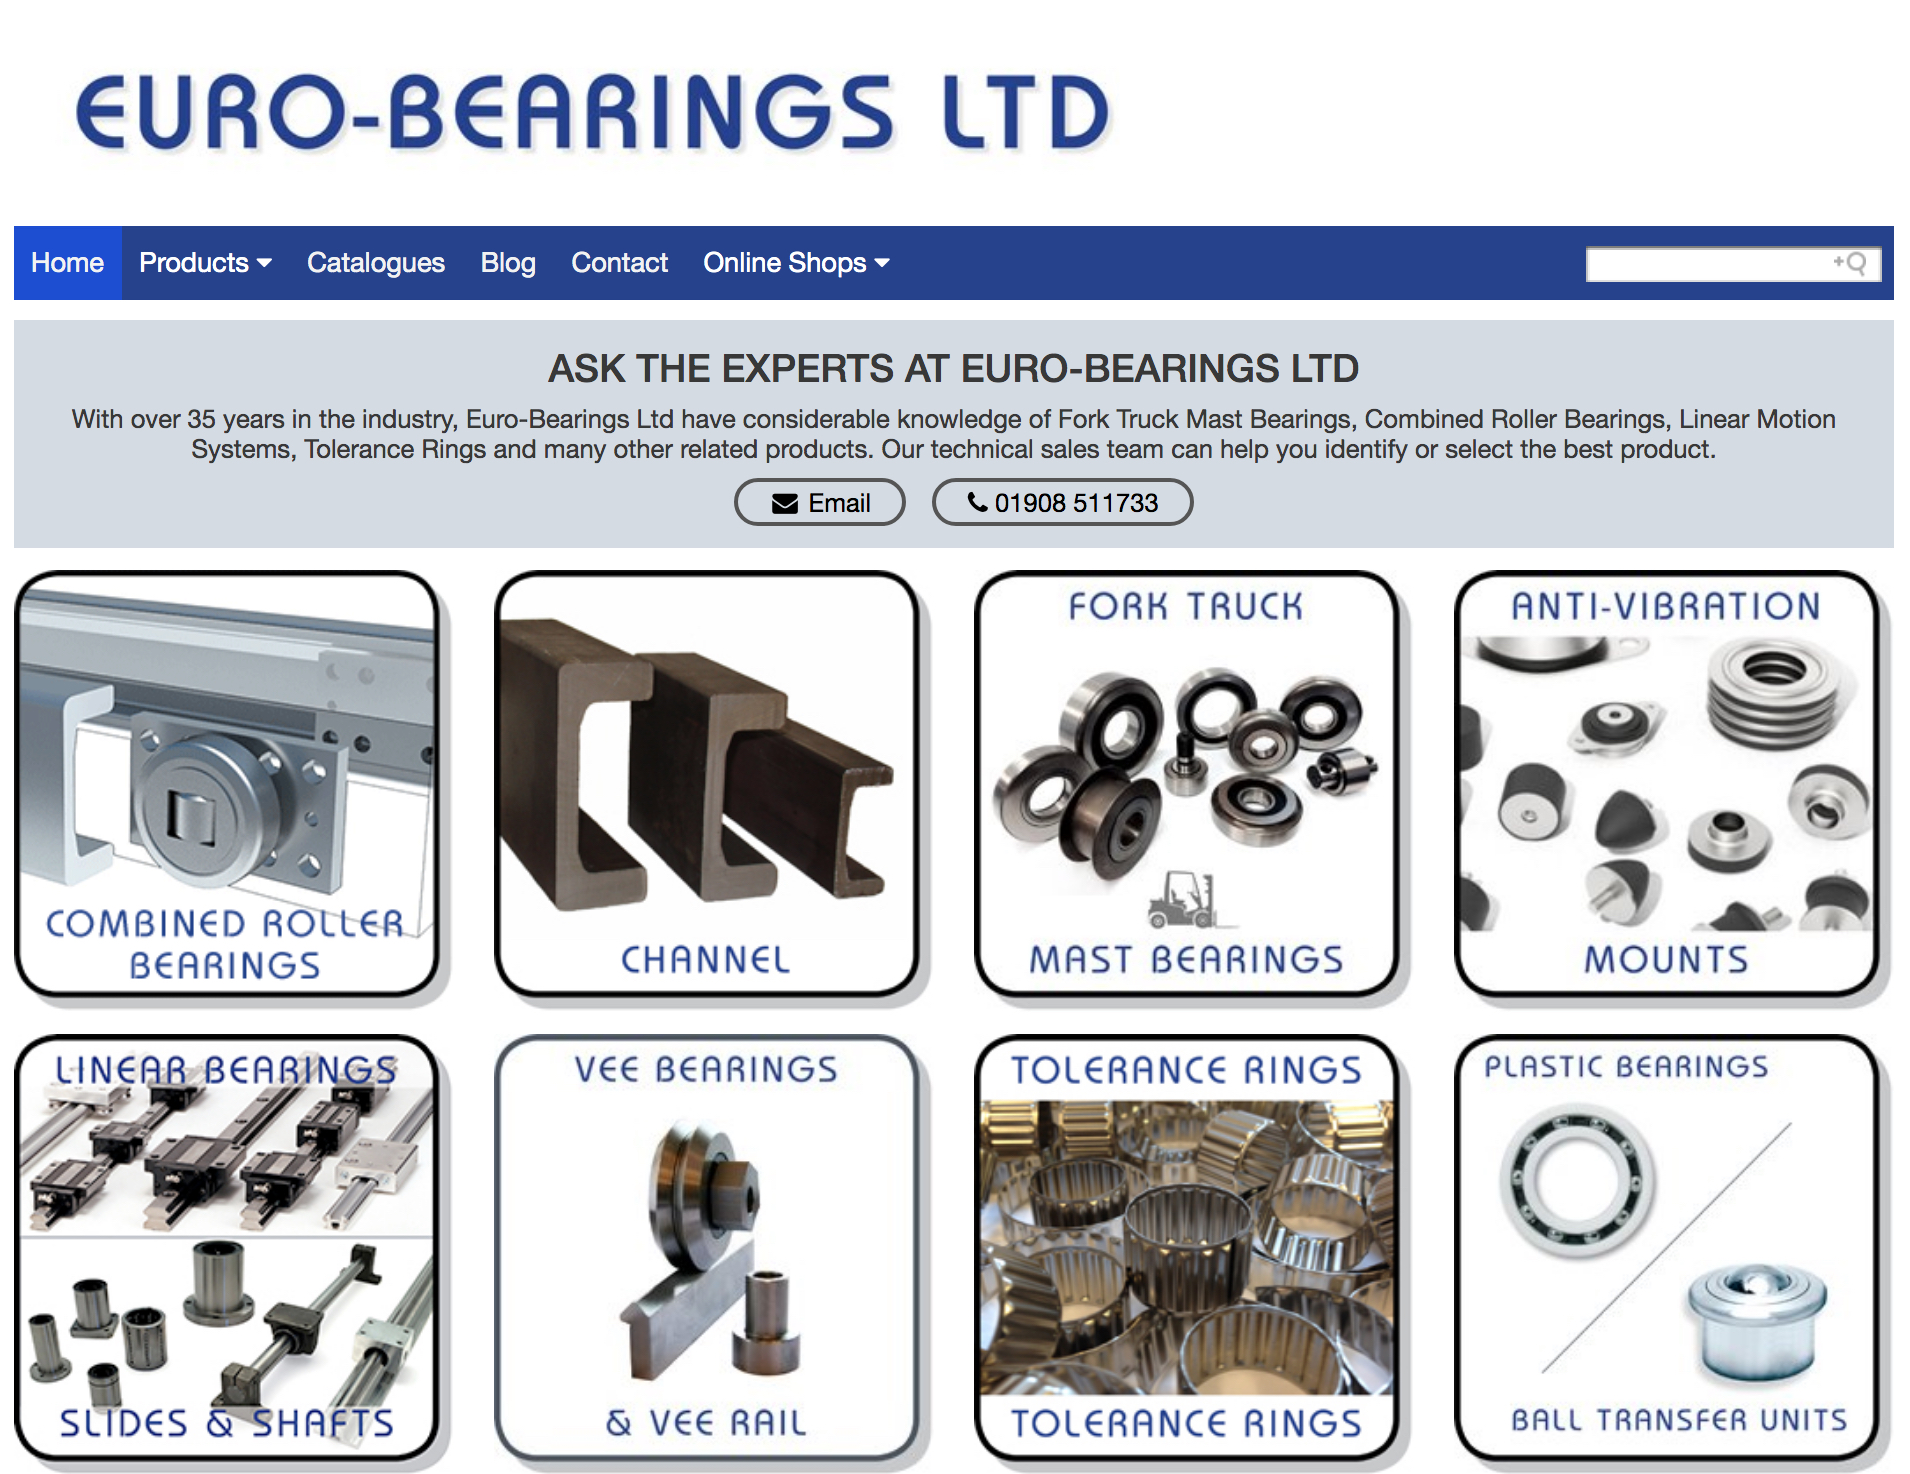 euro-bearings new website